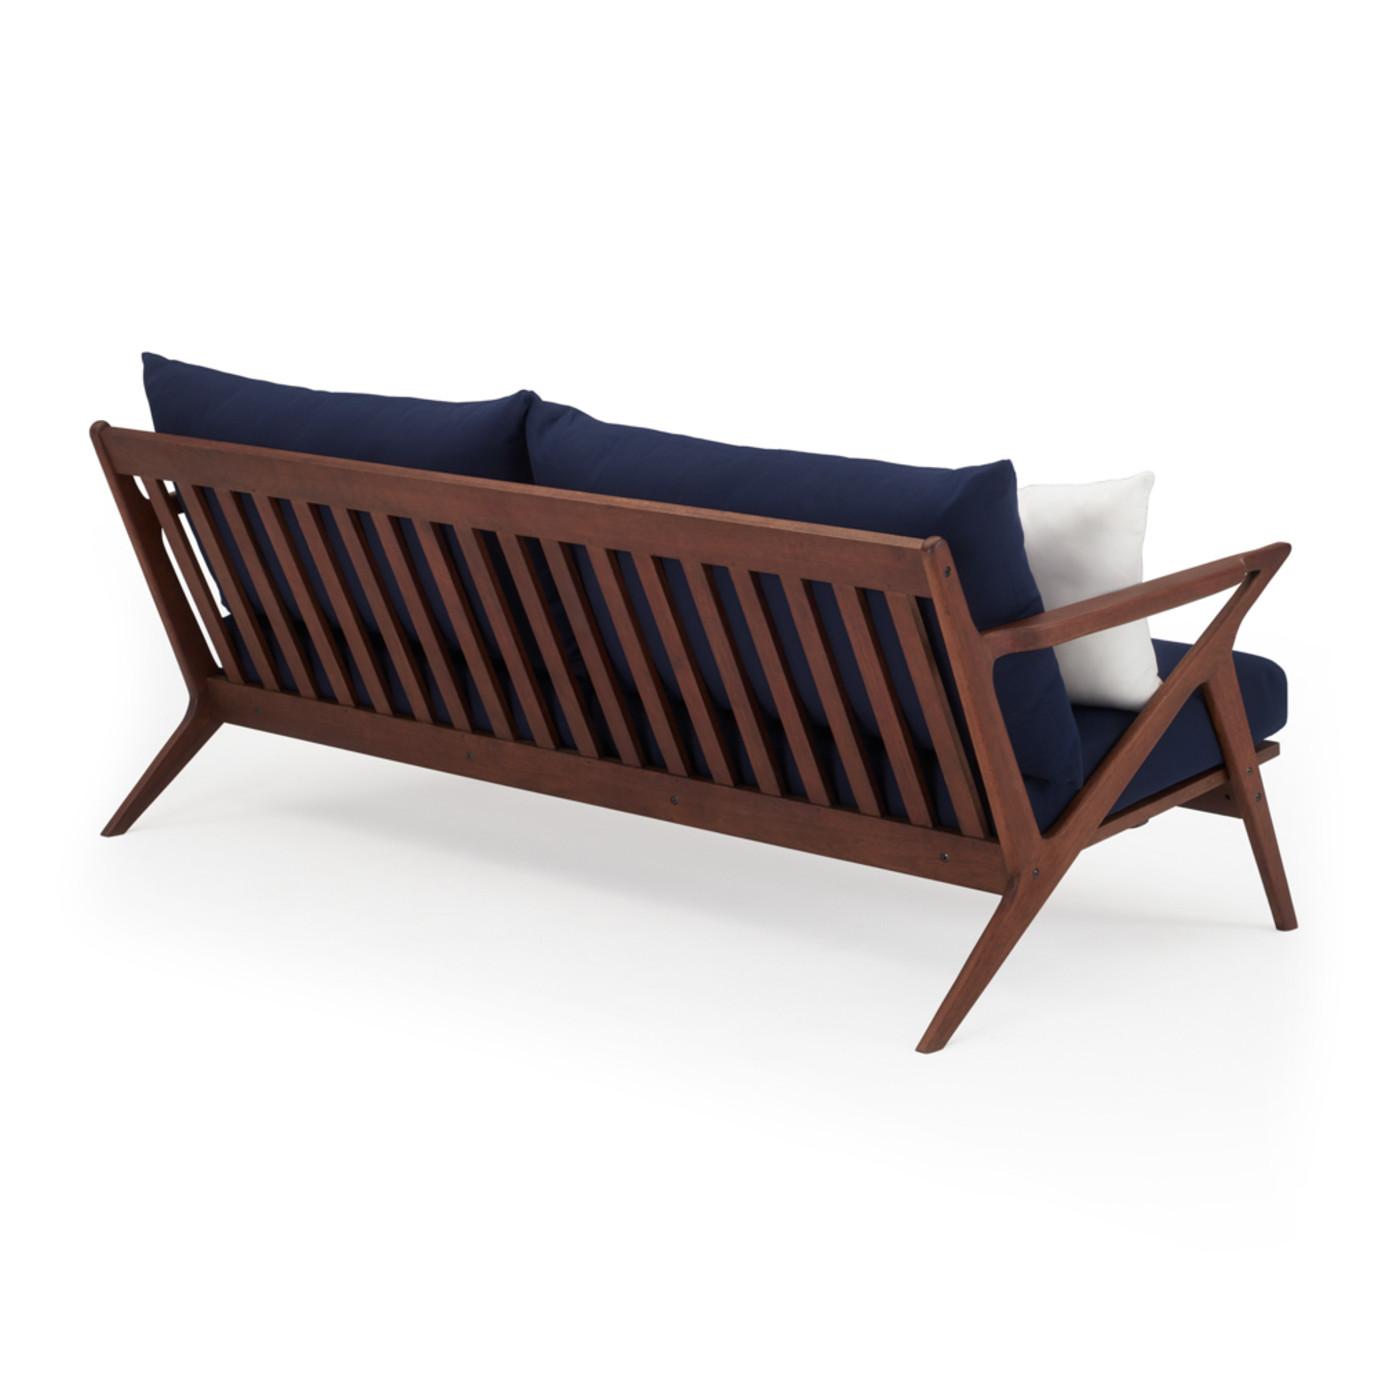 Vaughn 5 Piece Seating Set - Navy Blue